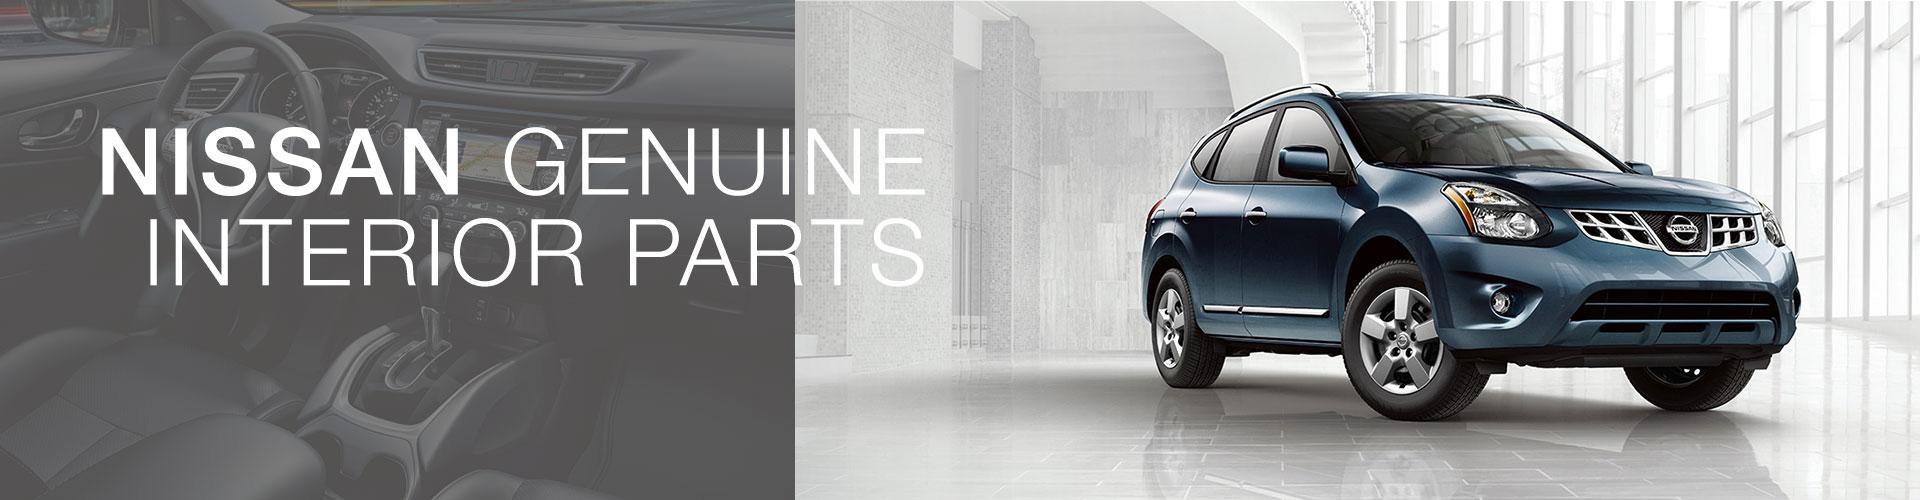 Nissan Genuine Interior Parts